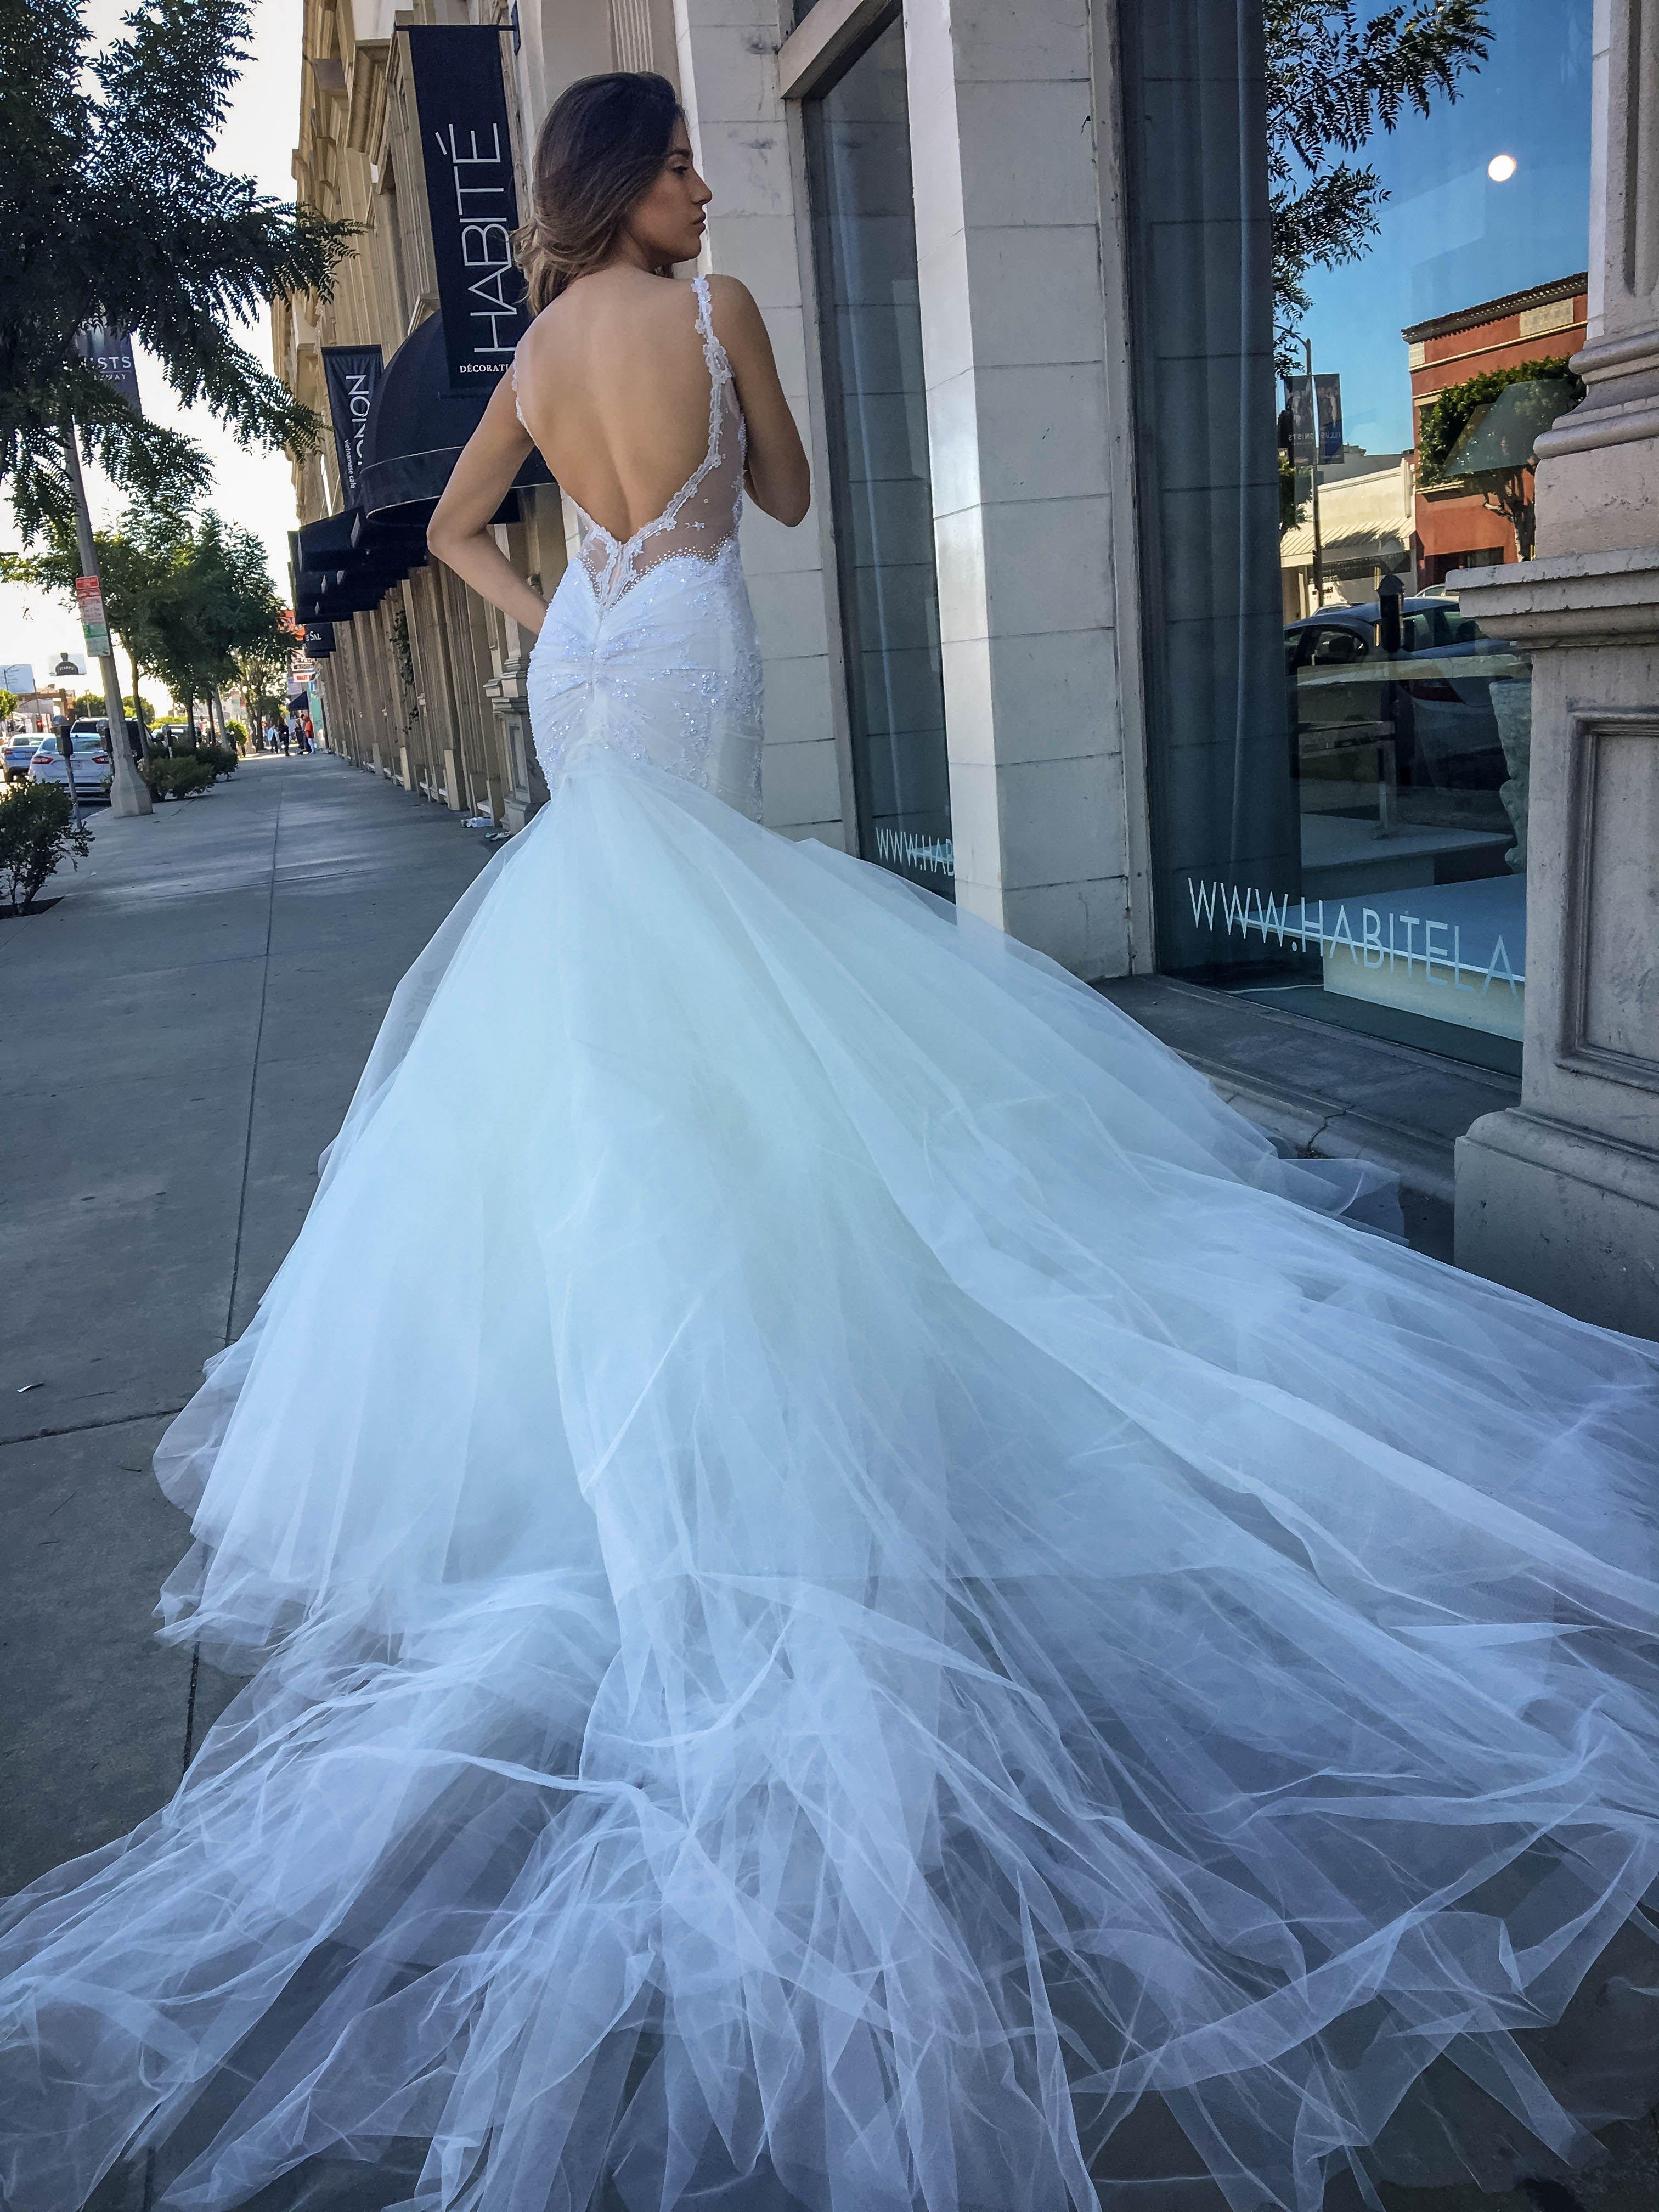 Famous Vestir A Novias Y Novios Illustration - All Wedding Dresses ...